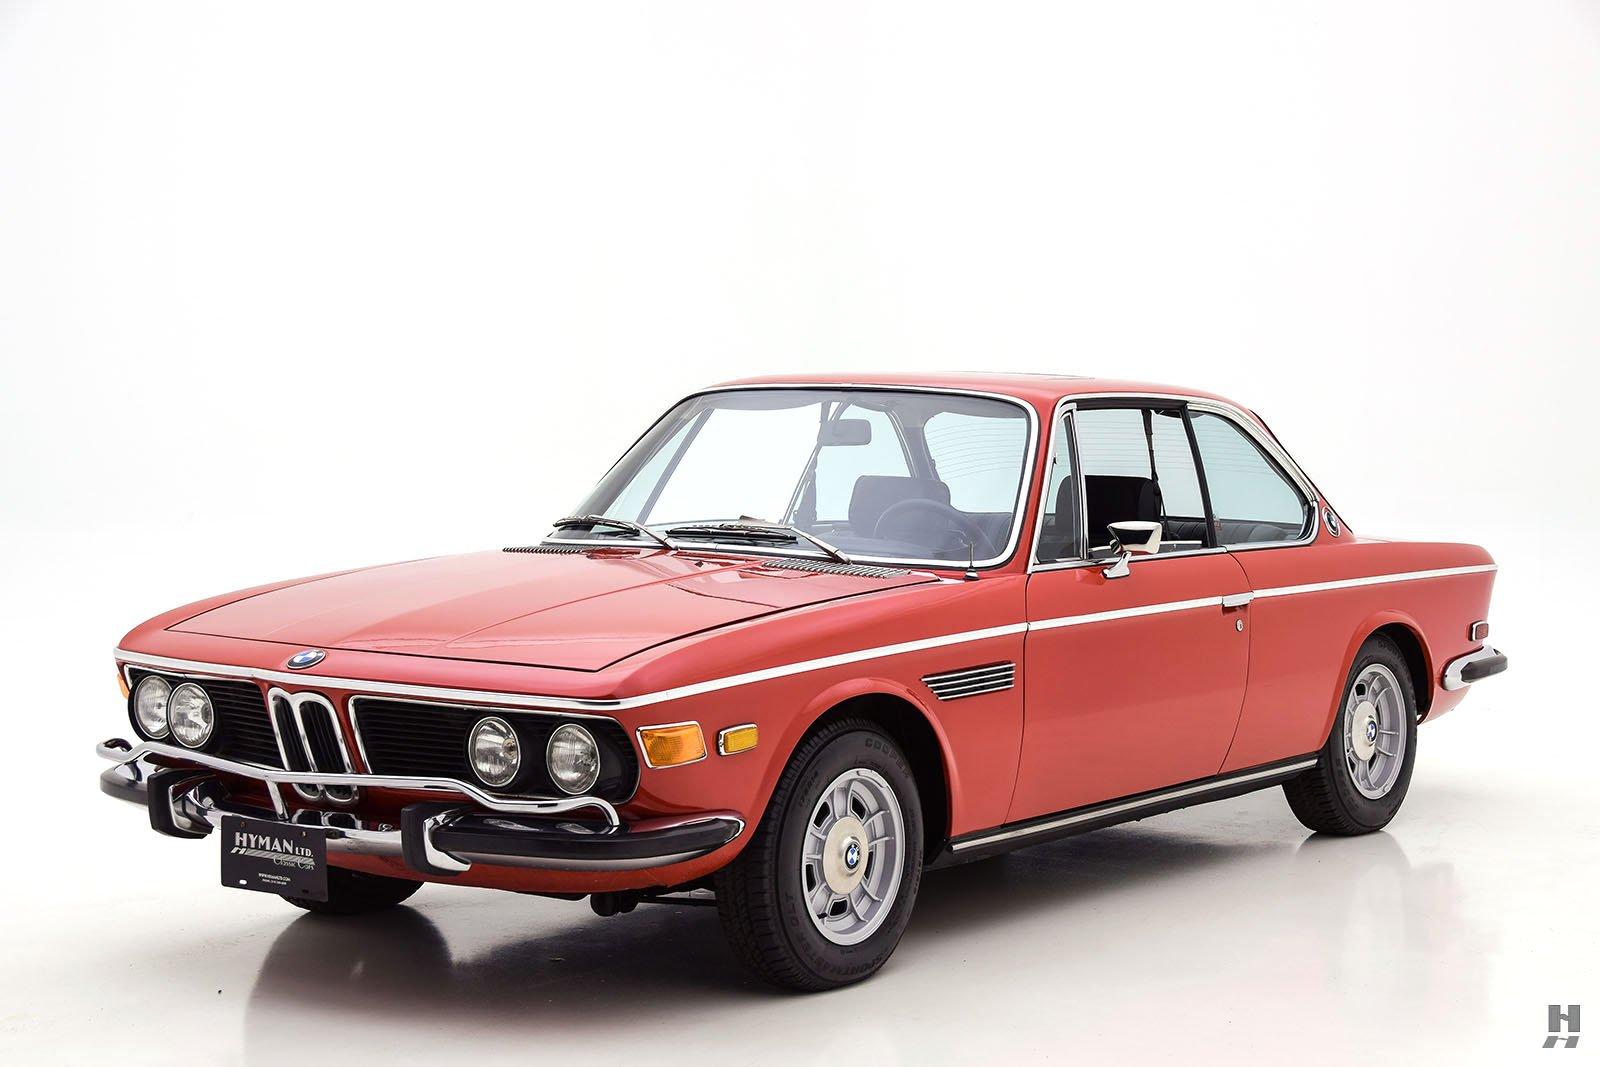 1972 bmw 3 0cs coupe for sale buy classic cars hyman ltd. Black Bedroom Furniture Sets. Home Design Ideas